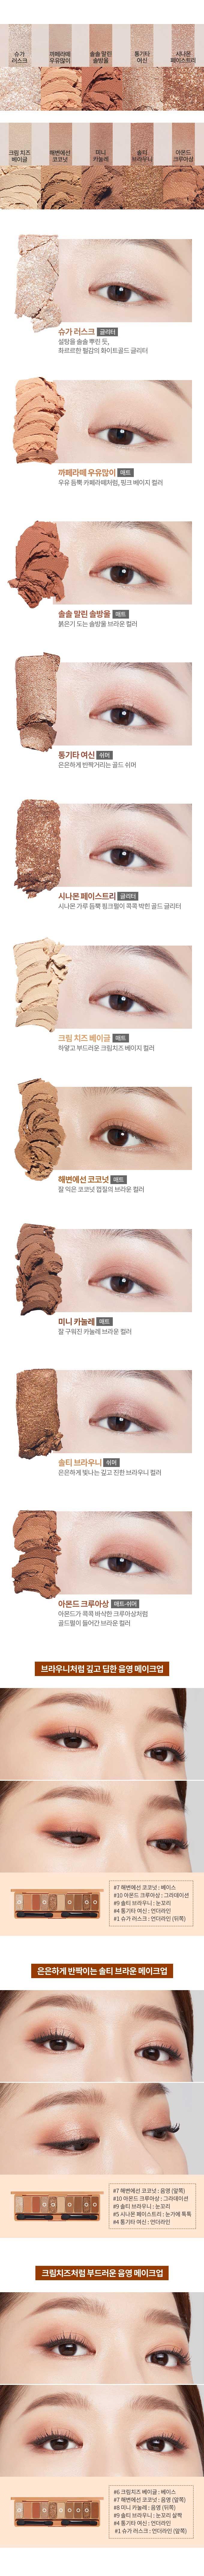 play-color-eyes-bakehouse-korean-cosmetics2.jpg